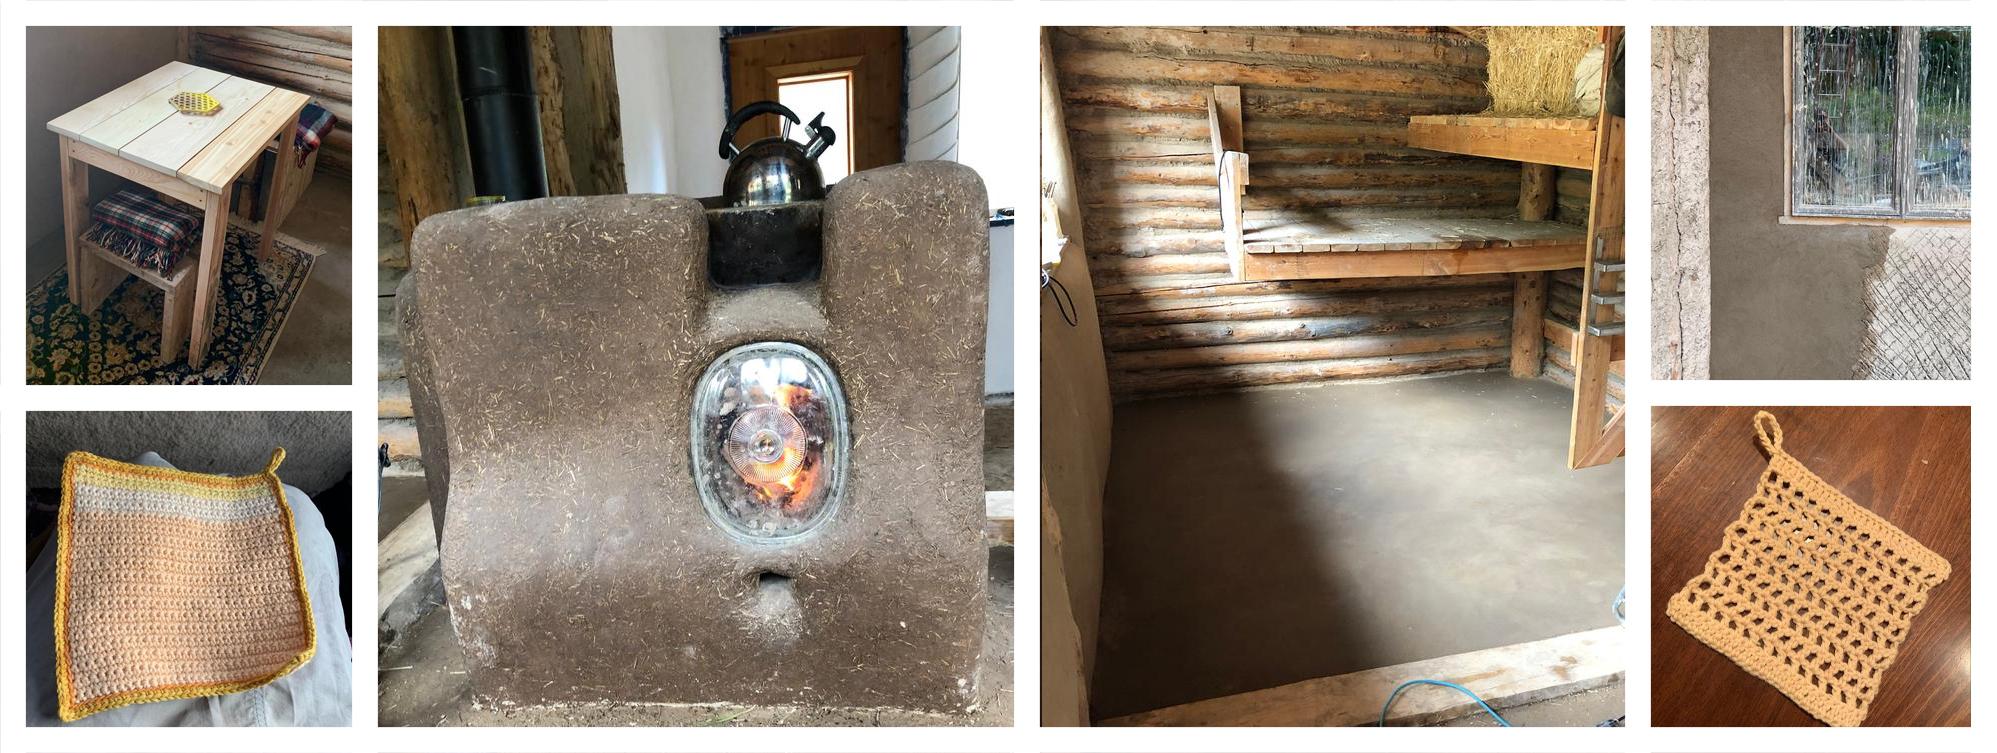 rocket stove, natural floor and siding, small wood table crochet